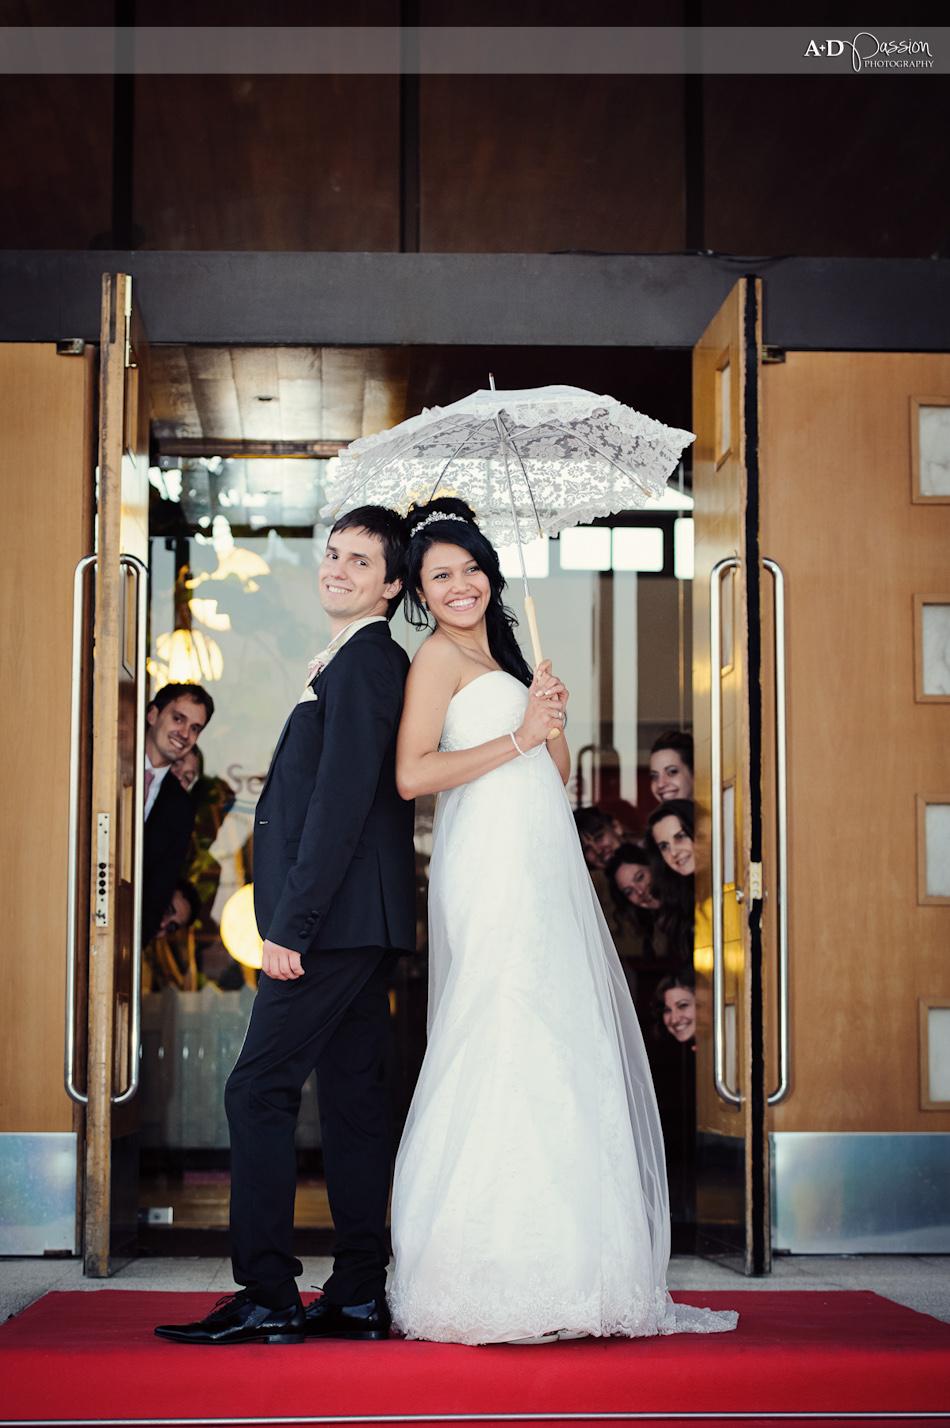 AD Passion Photography | 20120930_Gabriel&Iveth_Fotograf-profesionist-nunta_Nunta-Zaragoza-Spania_0160 | Adelin, Dida, fotograf profesionist, fotograf de nunta, fotografie de nunta, fotograf Timisoara, fotograf Craiova, fotograf Bucuresti, fotograf Arad, nunta Timisoara, nunta Arad, nunta Bucuresti, nunta Craiova